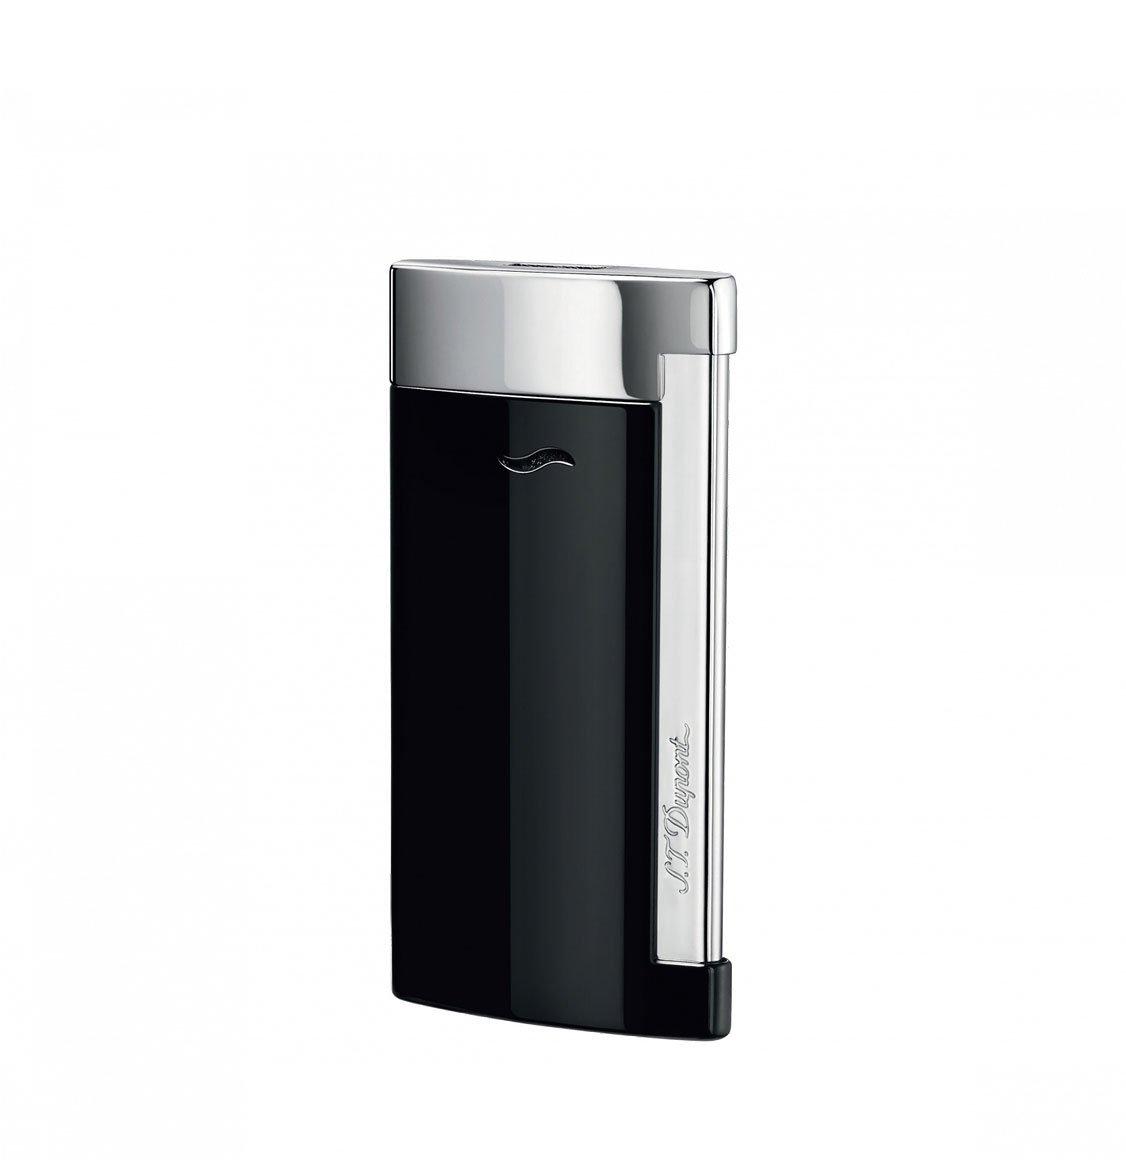 S.T. Dupont Αναπτήρας Slim 7 Black Lighter